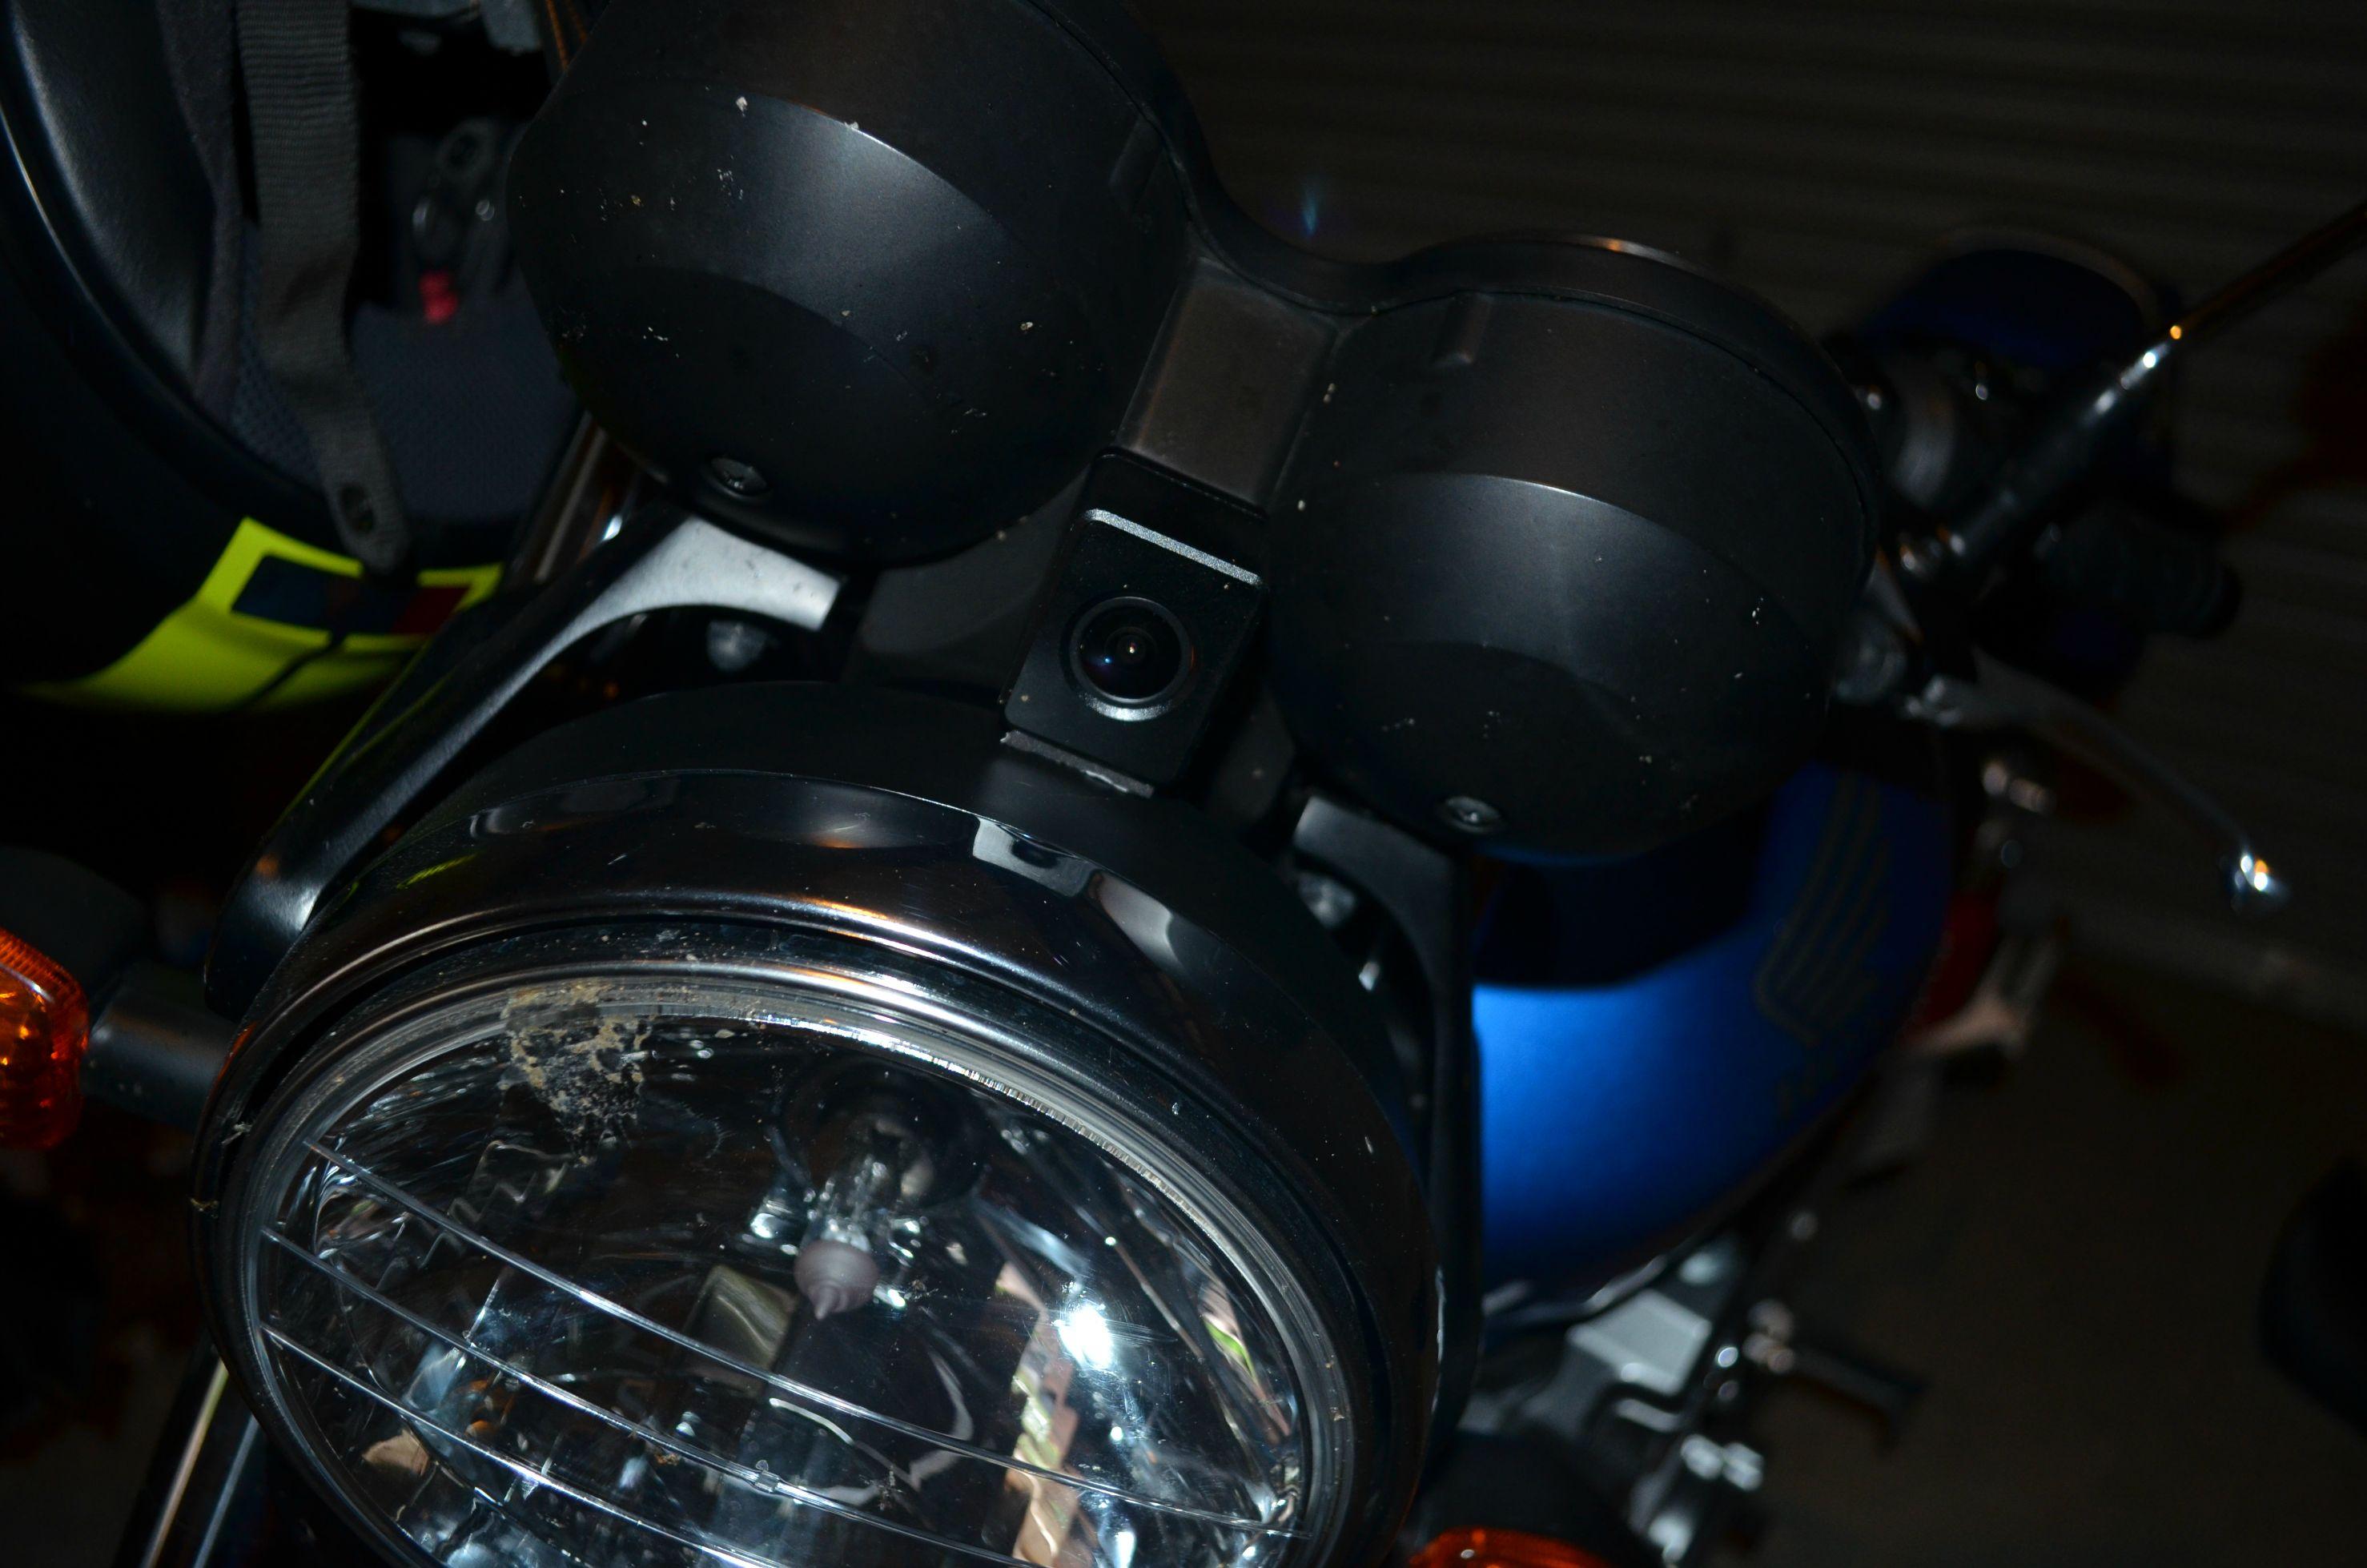 Innovv K1 Motocam Motorcycle Camera Worldwide Ducati Diavel Fuse Box